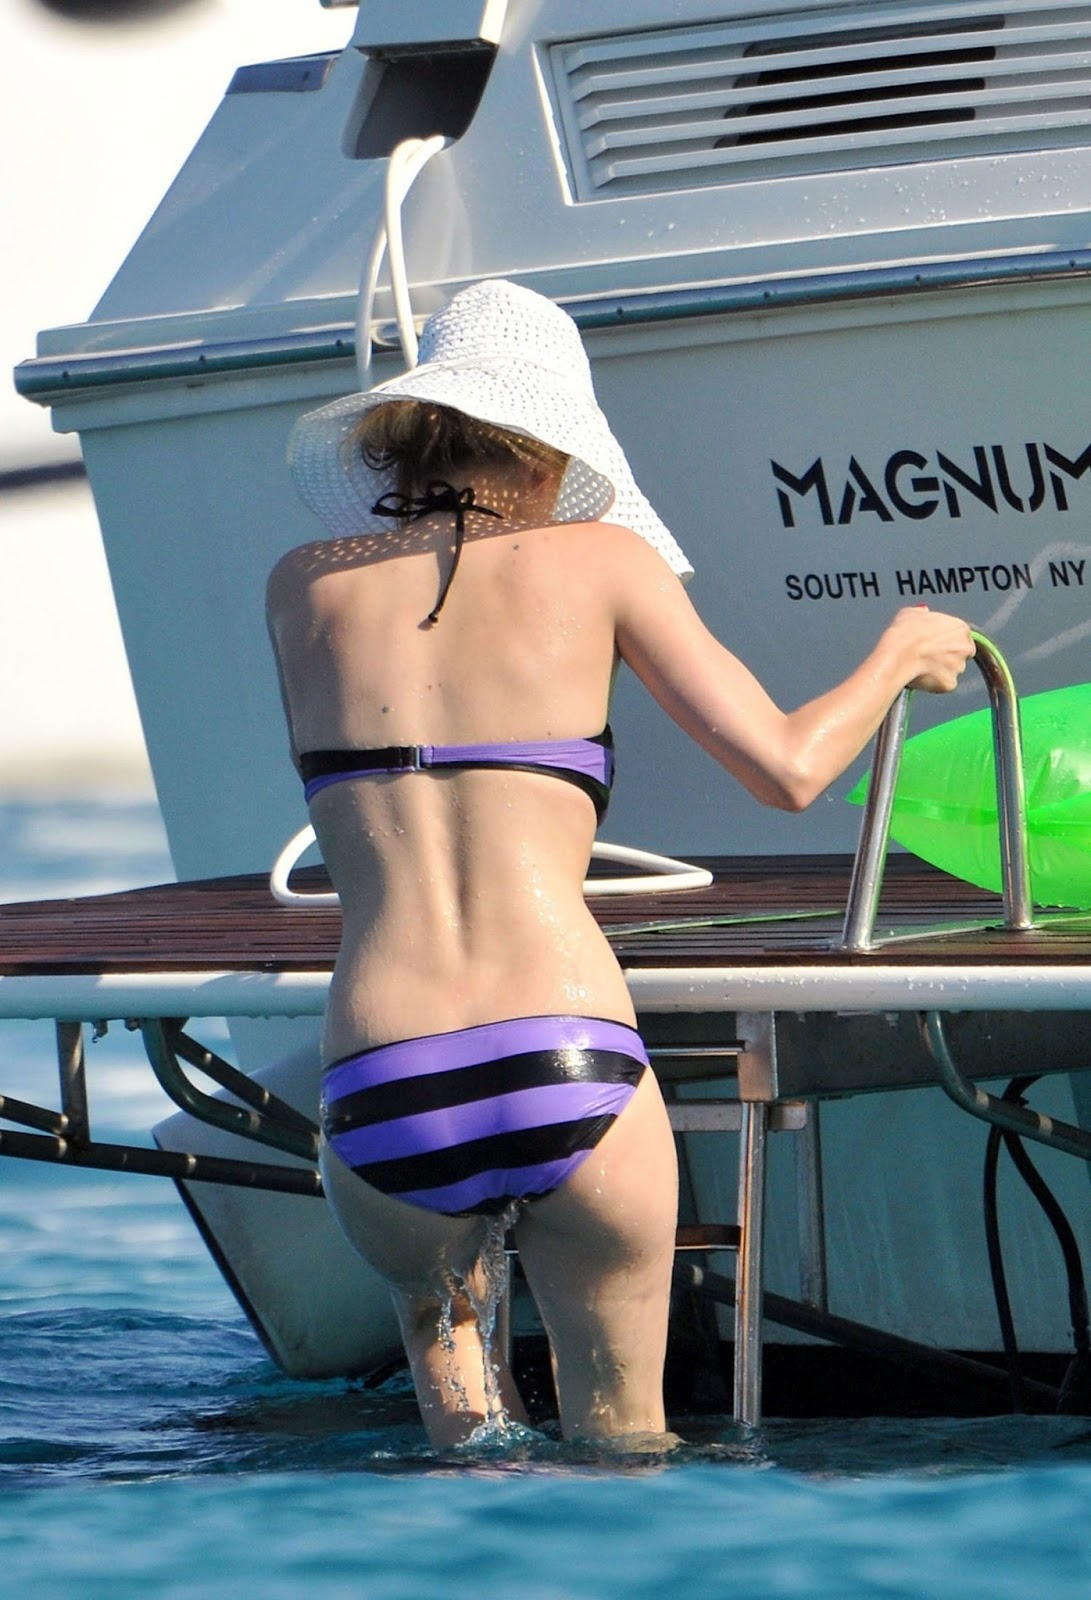 Avril Lavigne: Avril Lavigne swimsuit